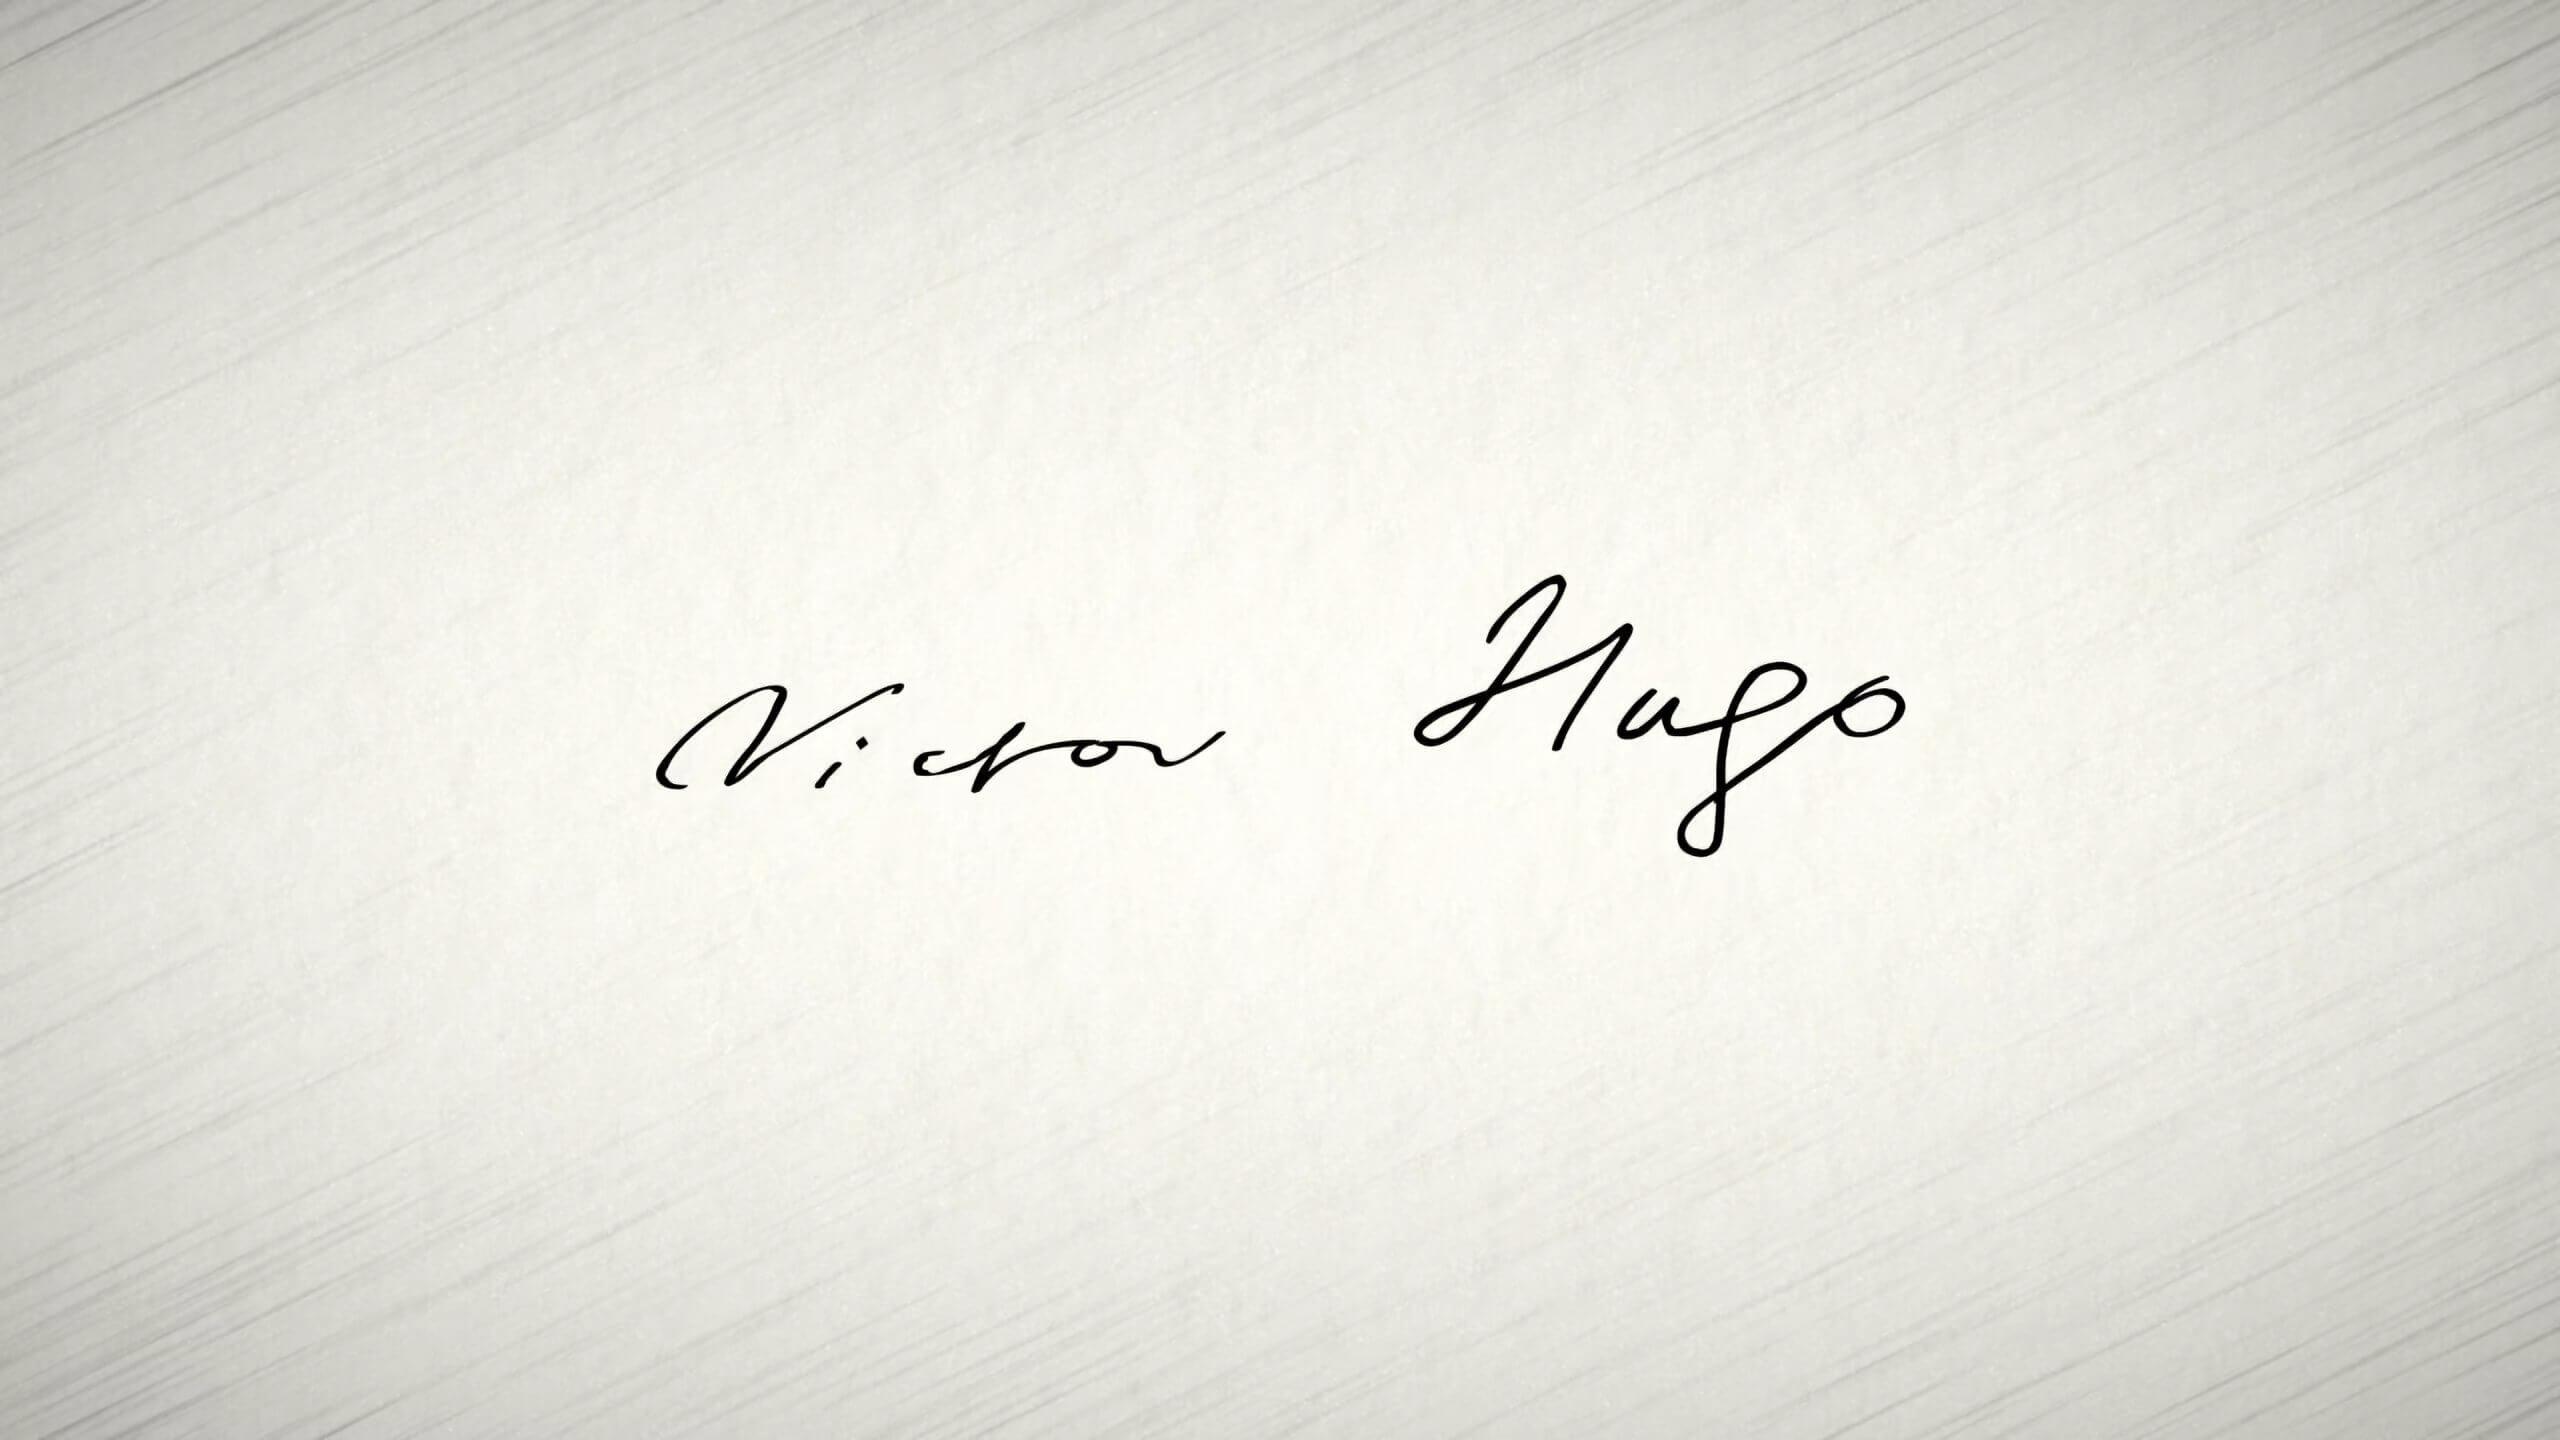 Victor Hugo Signature